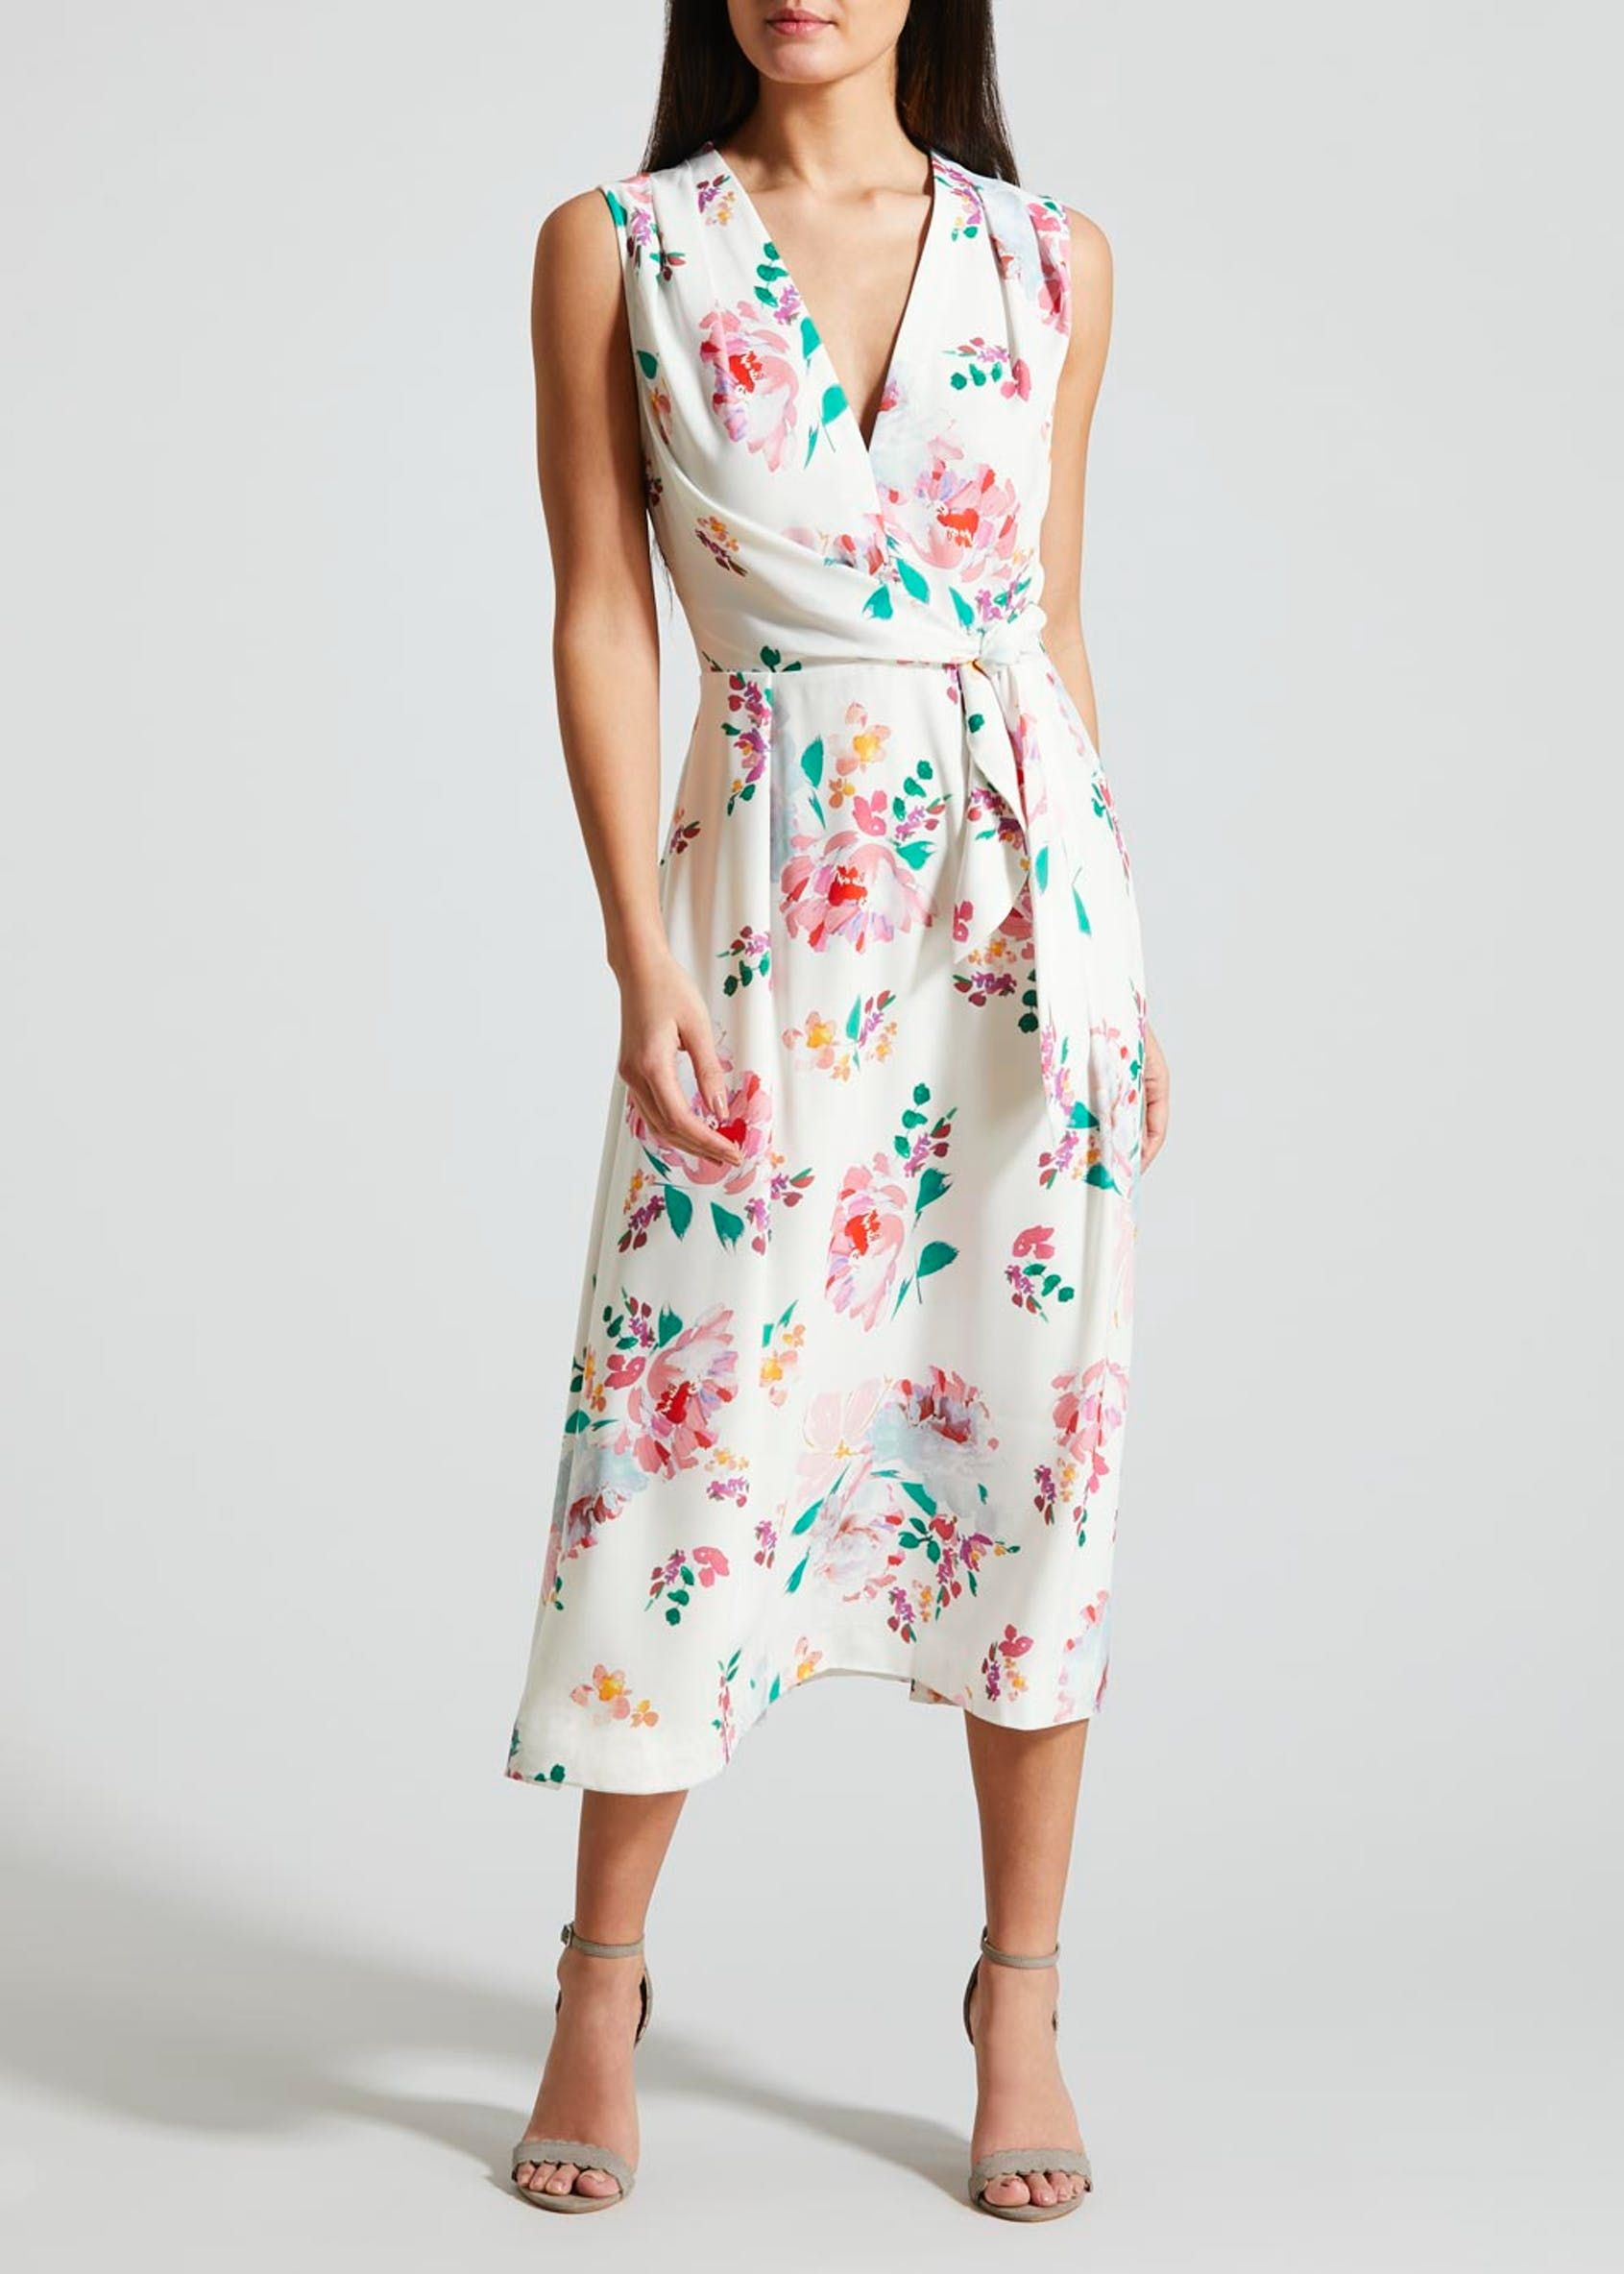 c1b441d14cbb5e FWM Floral Toe Side Wrap Dress in 2019 | what to wear? | Dresses ...